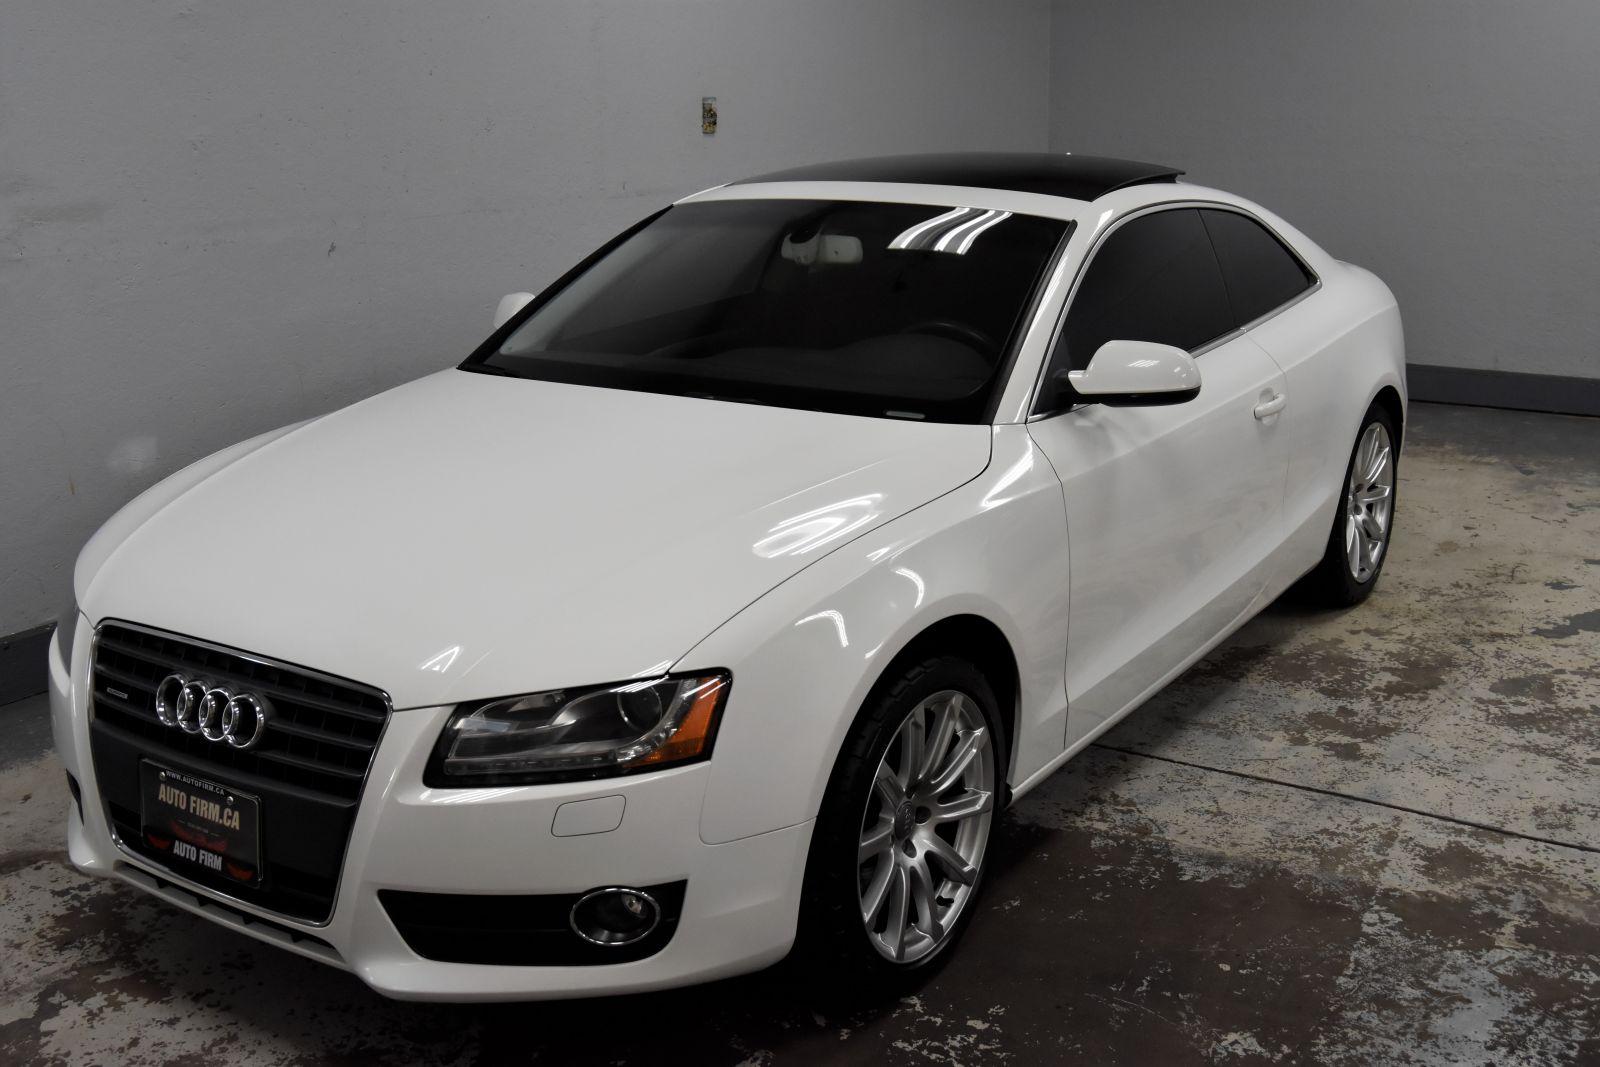 2010 Audi A5 Image